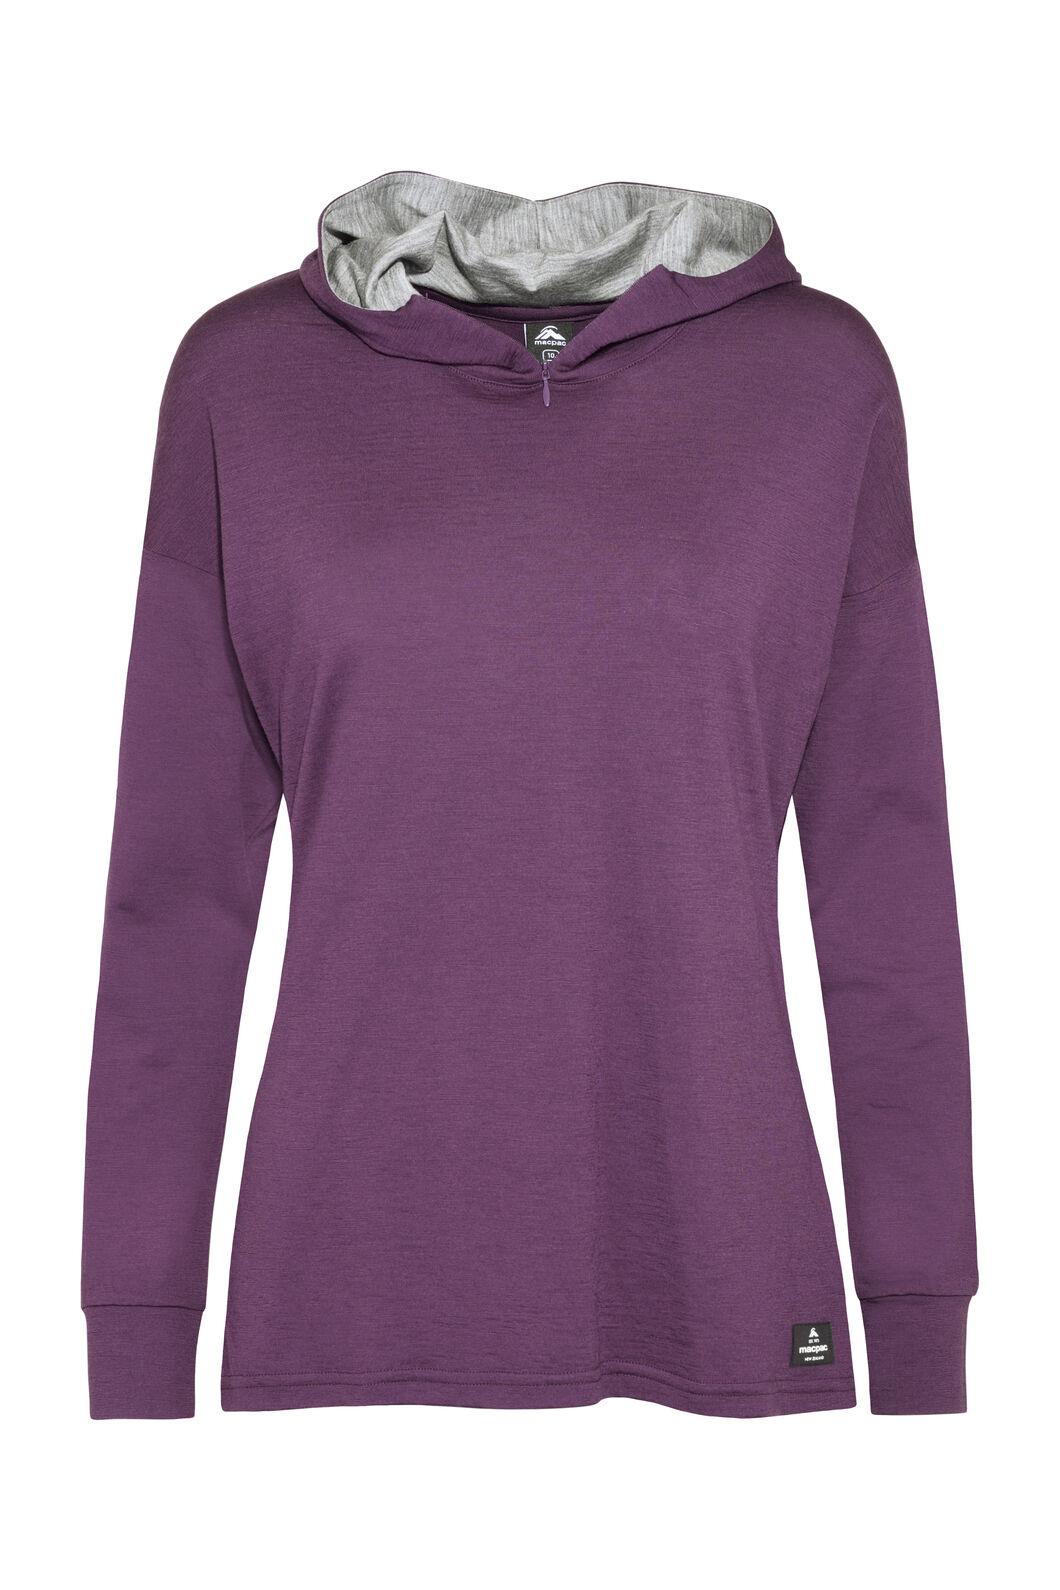 Macpac Tori 180 Hooded Pullover — Women's, Blackberry Wine, hi-res